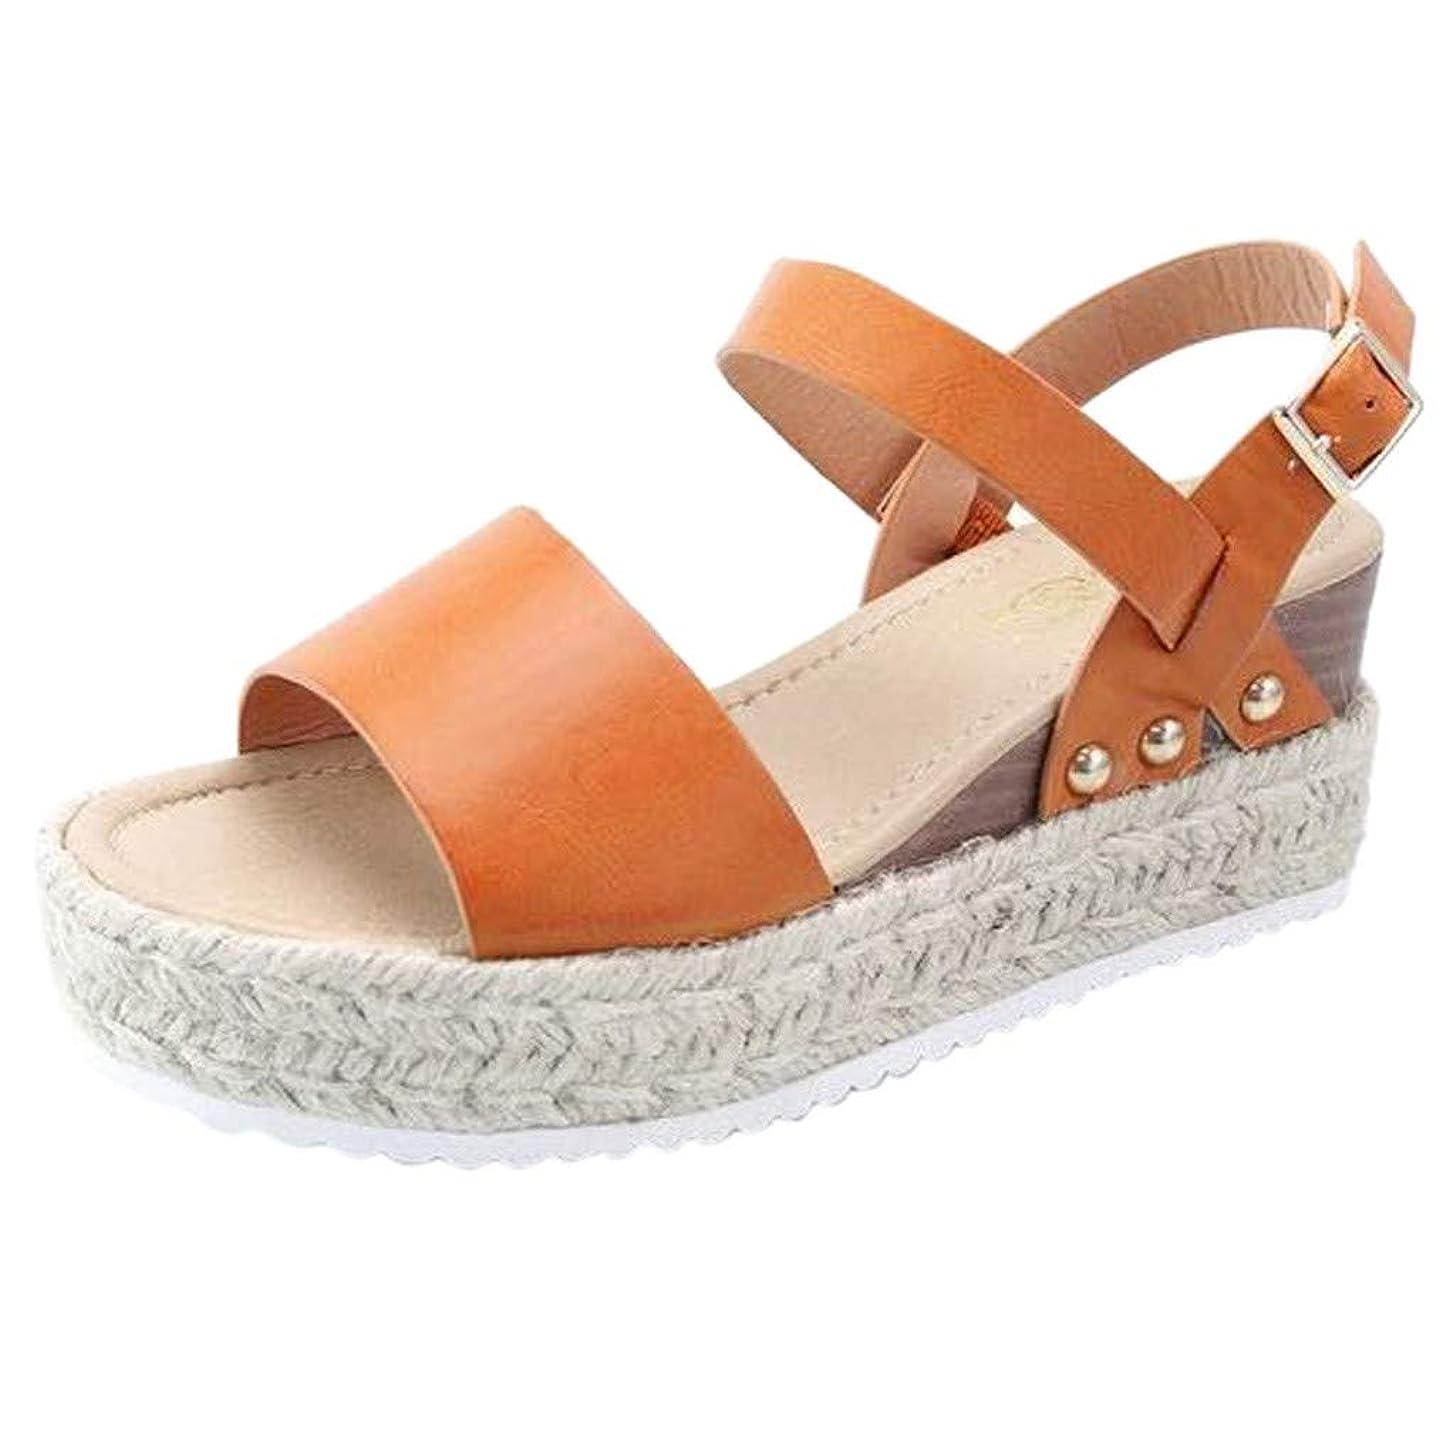 Duseedik Summer Women's Platform Sandals Fashion Buckle Strap Wedges Retro Peep Toe Outdoor Shoes